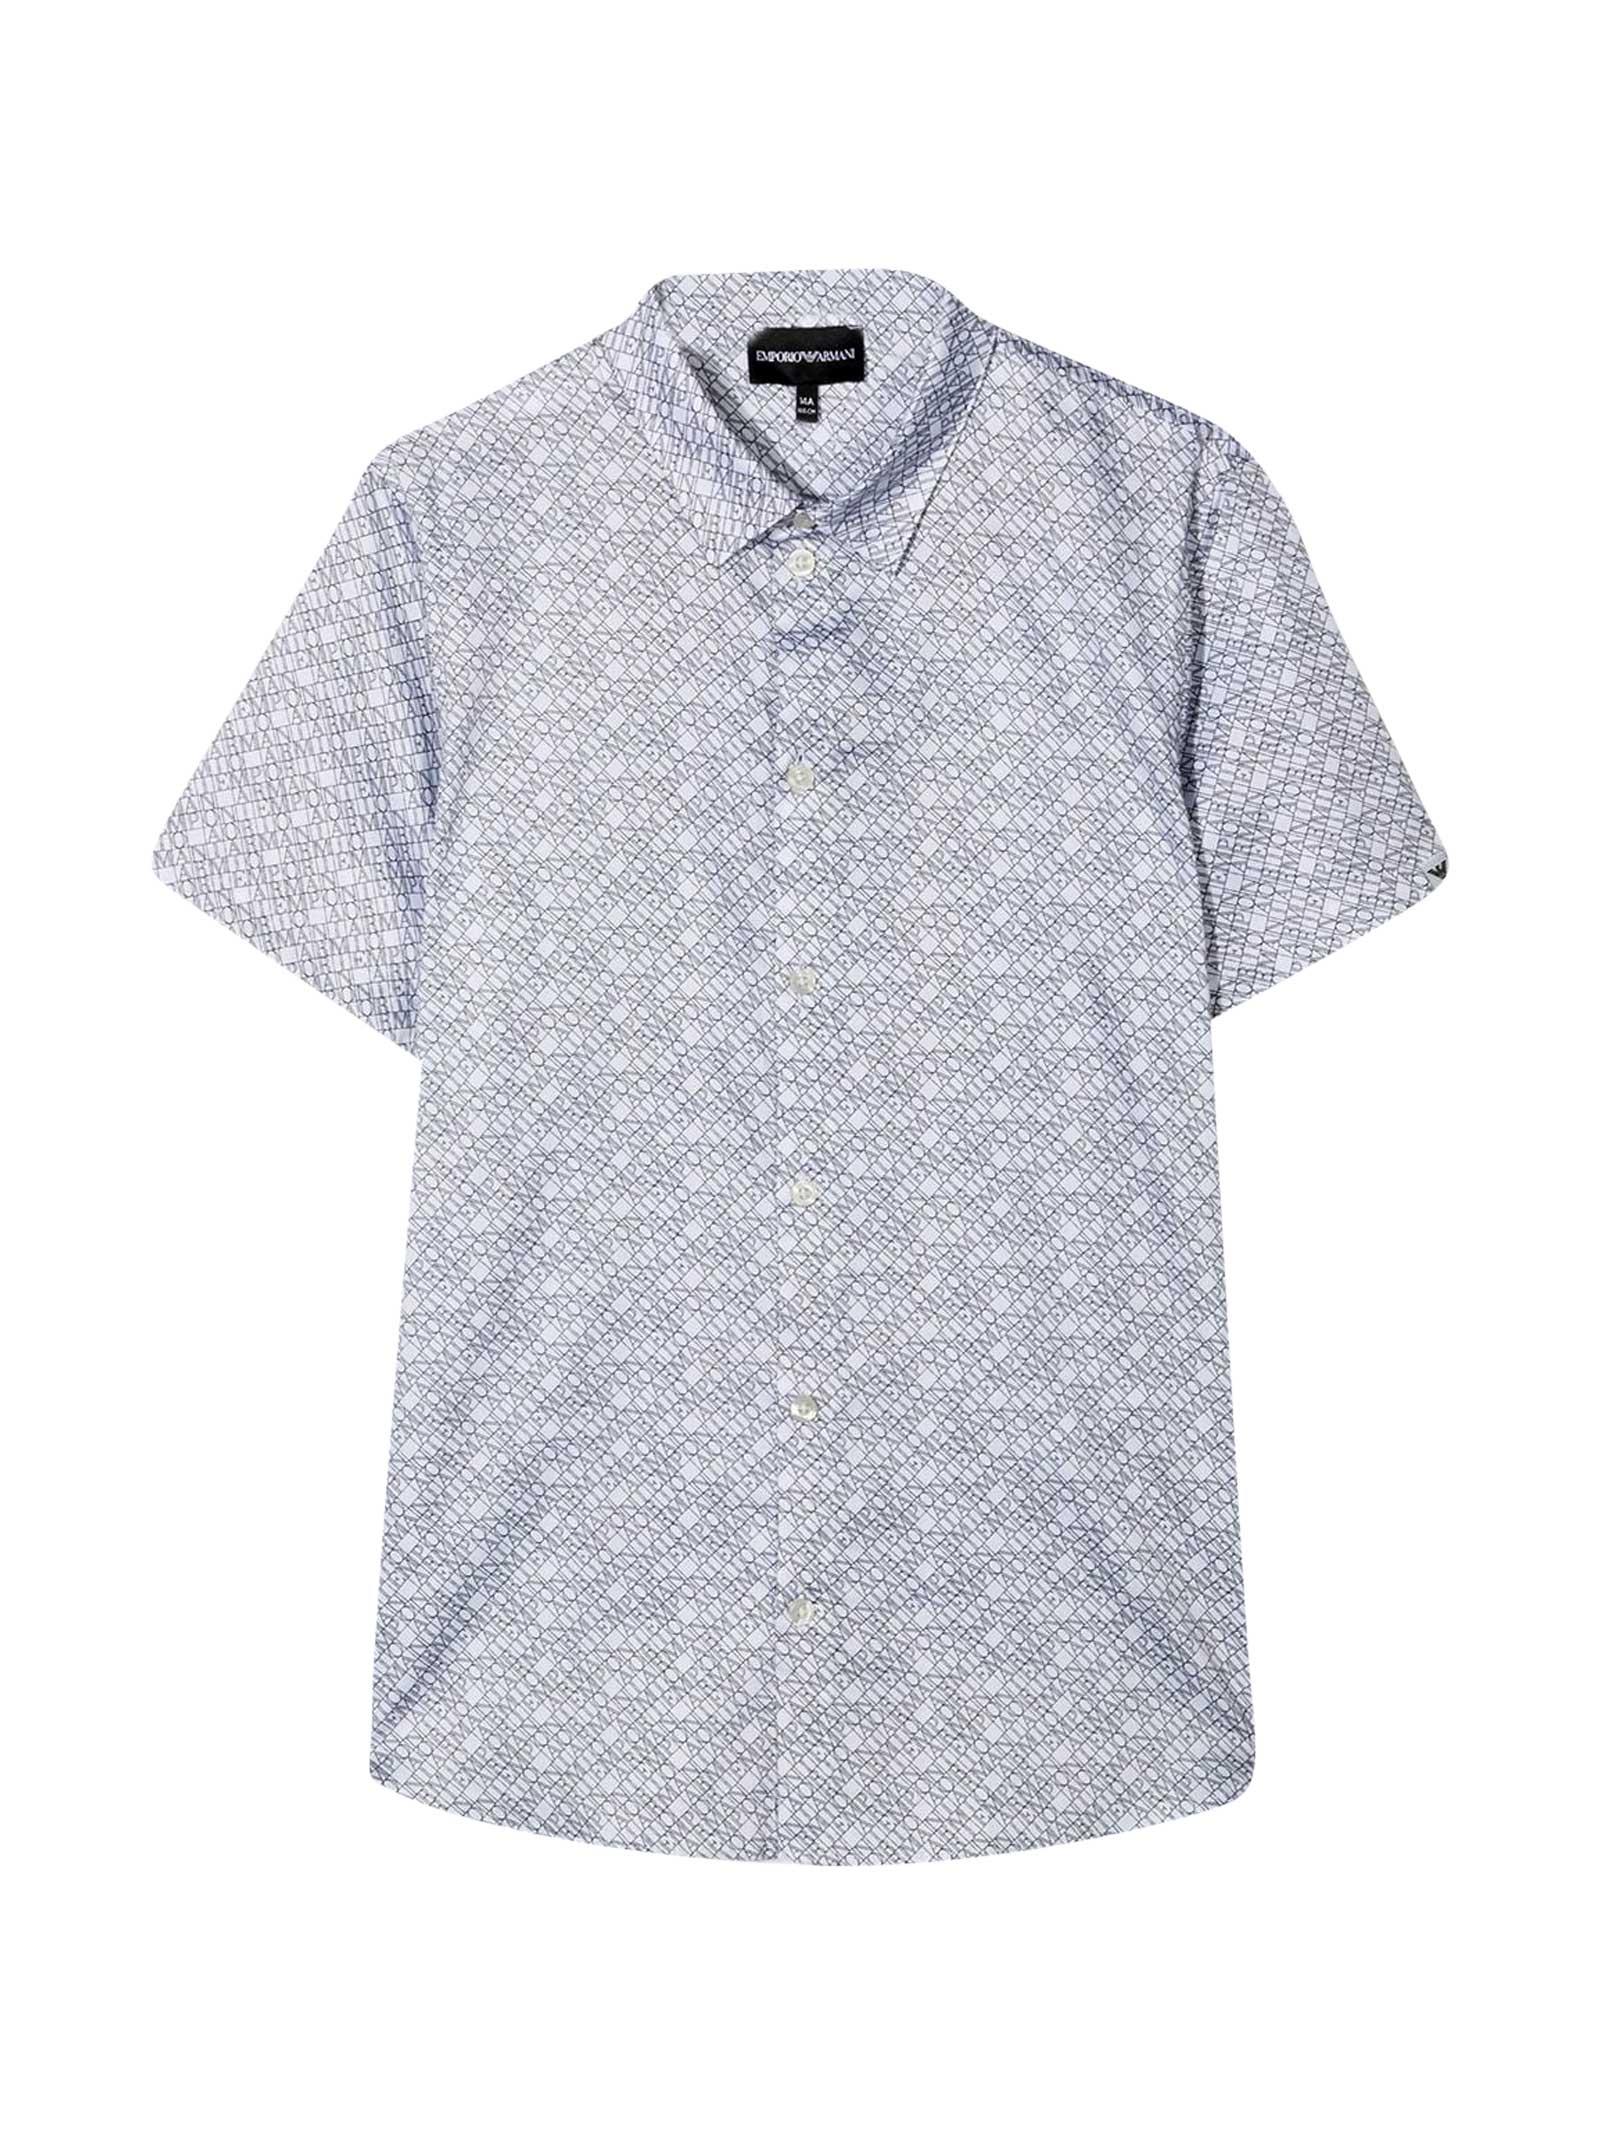 Emporio Armani Teen Shirt With Press